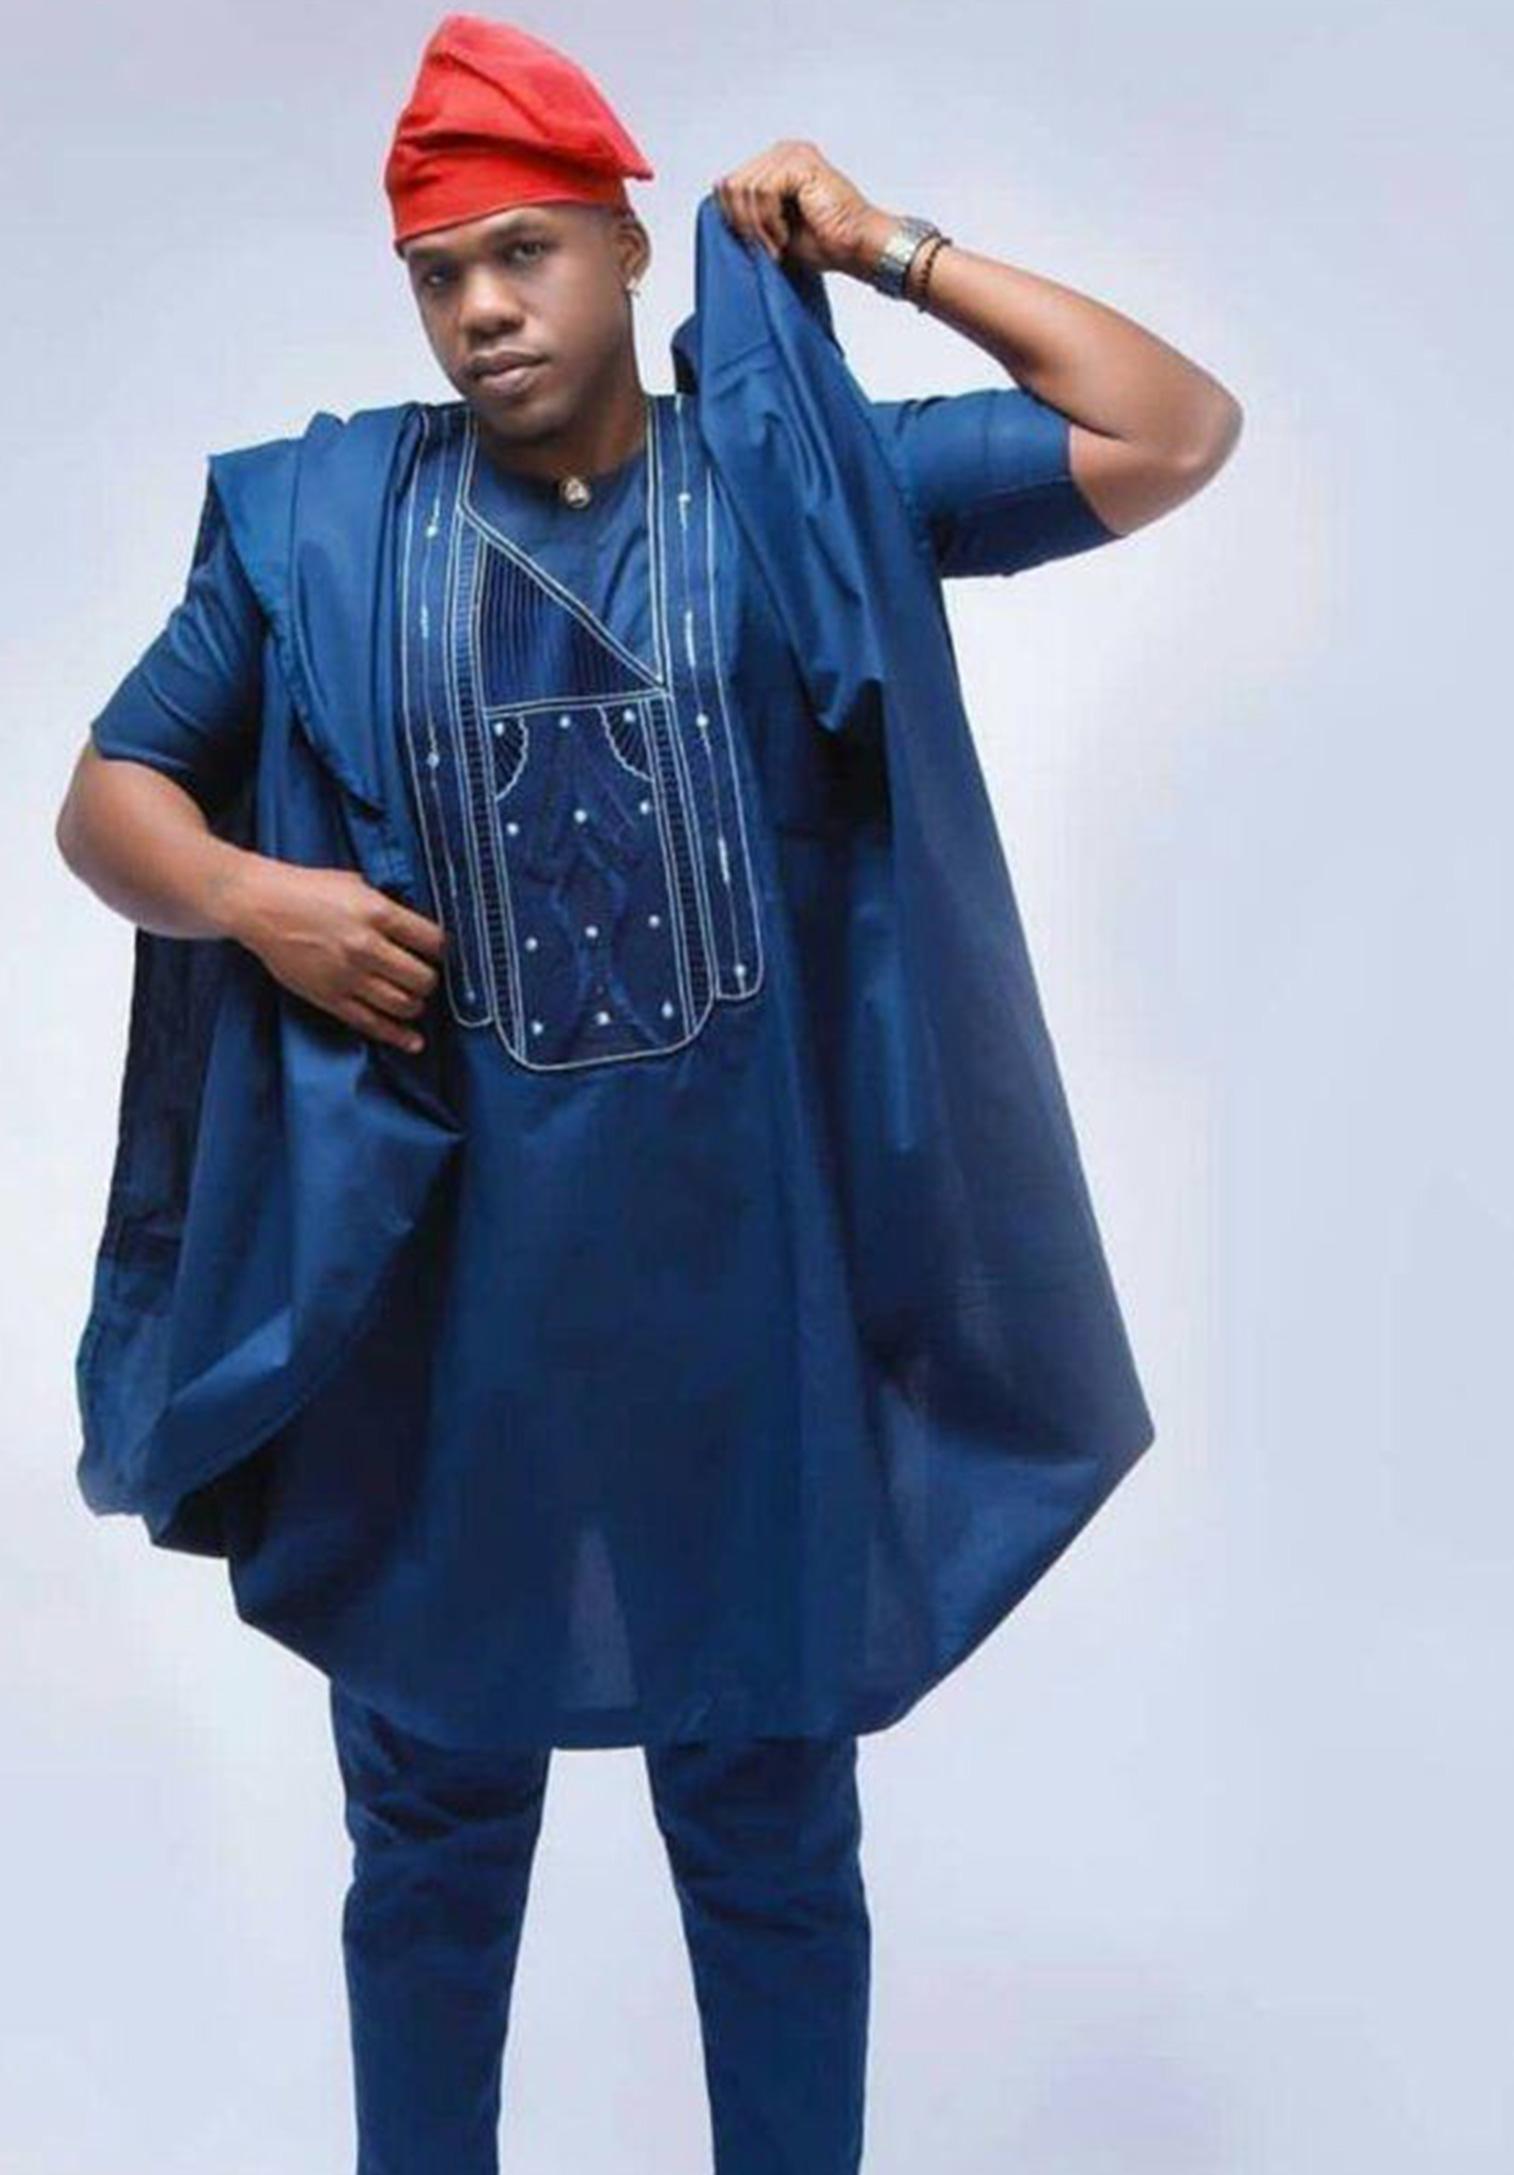 Nigerian Agbada outfit for men - Kipfashion